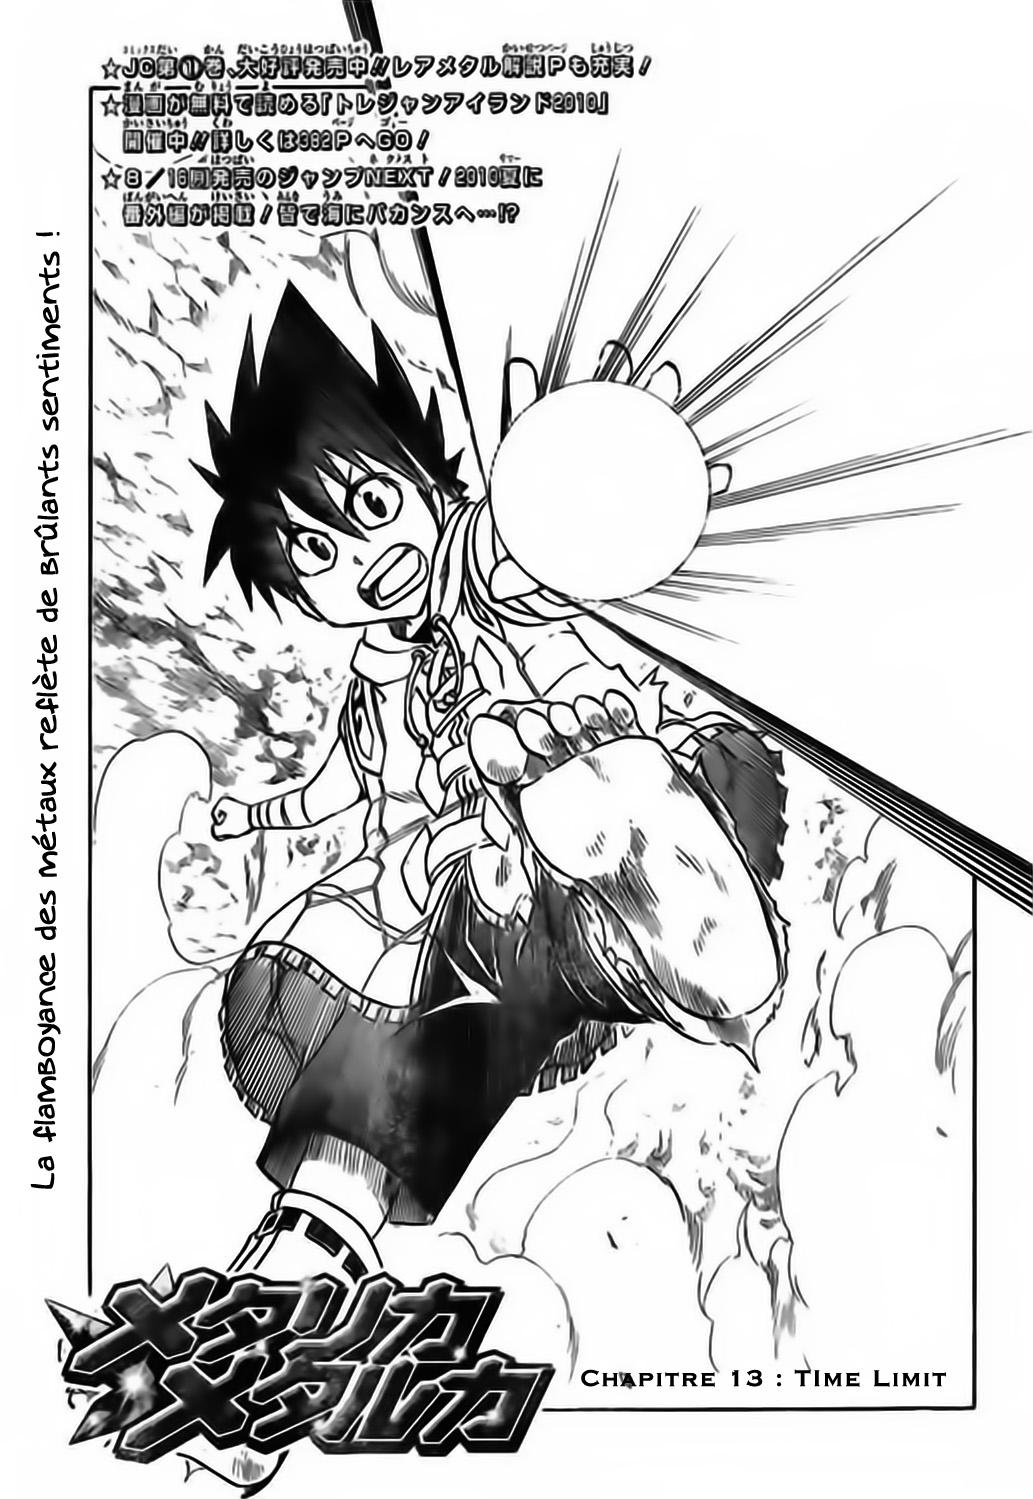 https://nine.mangadogs.com/fr_manga/pic1/28/284/18774/MetallicaMetalluca13VF_0_702.jpg Page 1